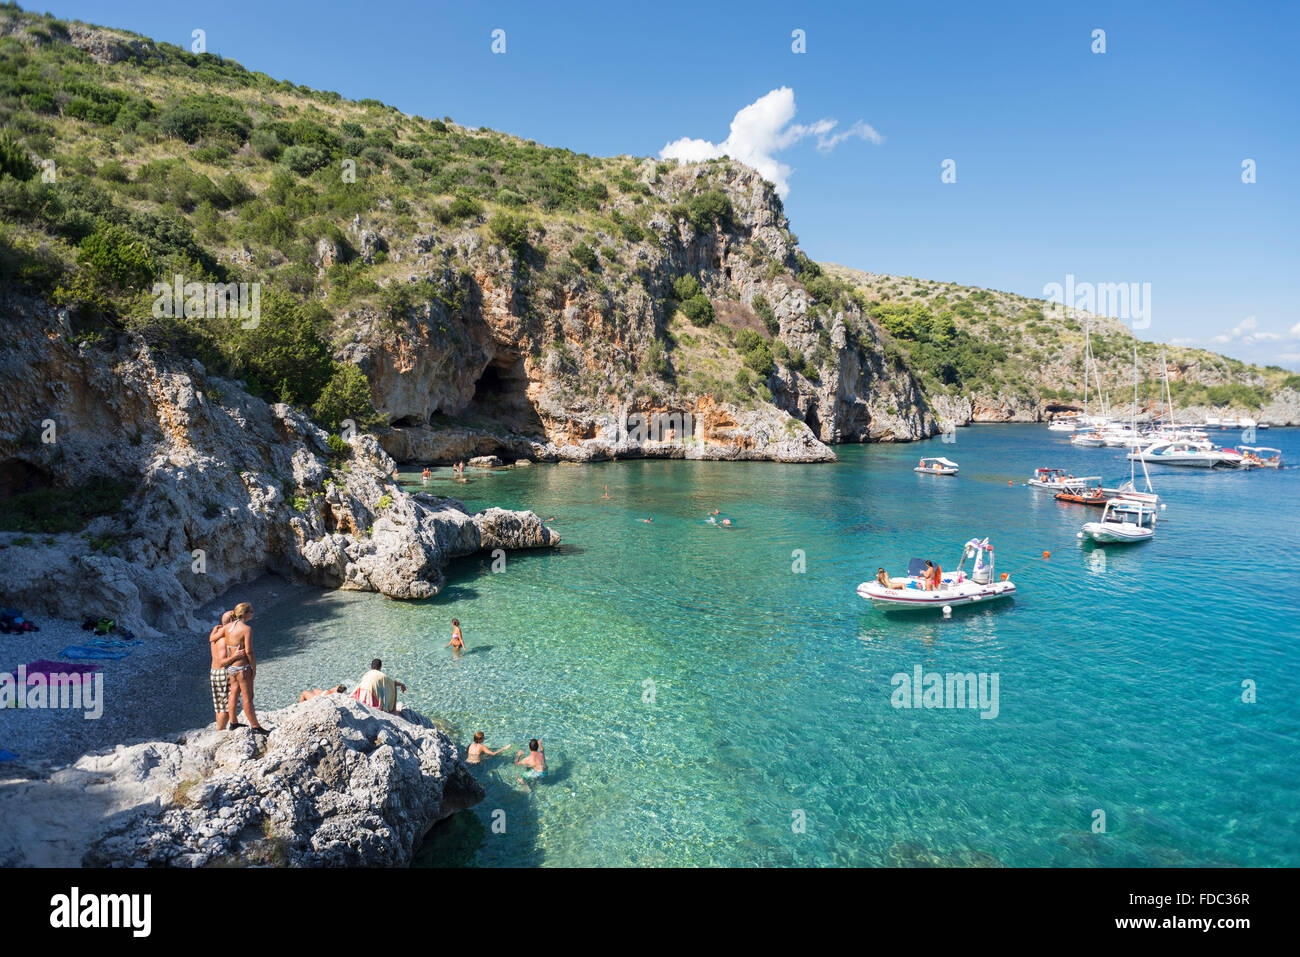 Hot springs underneath the cavern in the Baia degli Infreschi bay with at the Mediterranean Sea coast in Cilento,Campania, - Stock Image